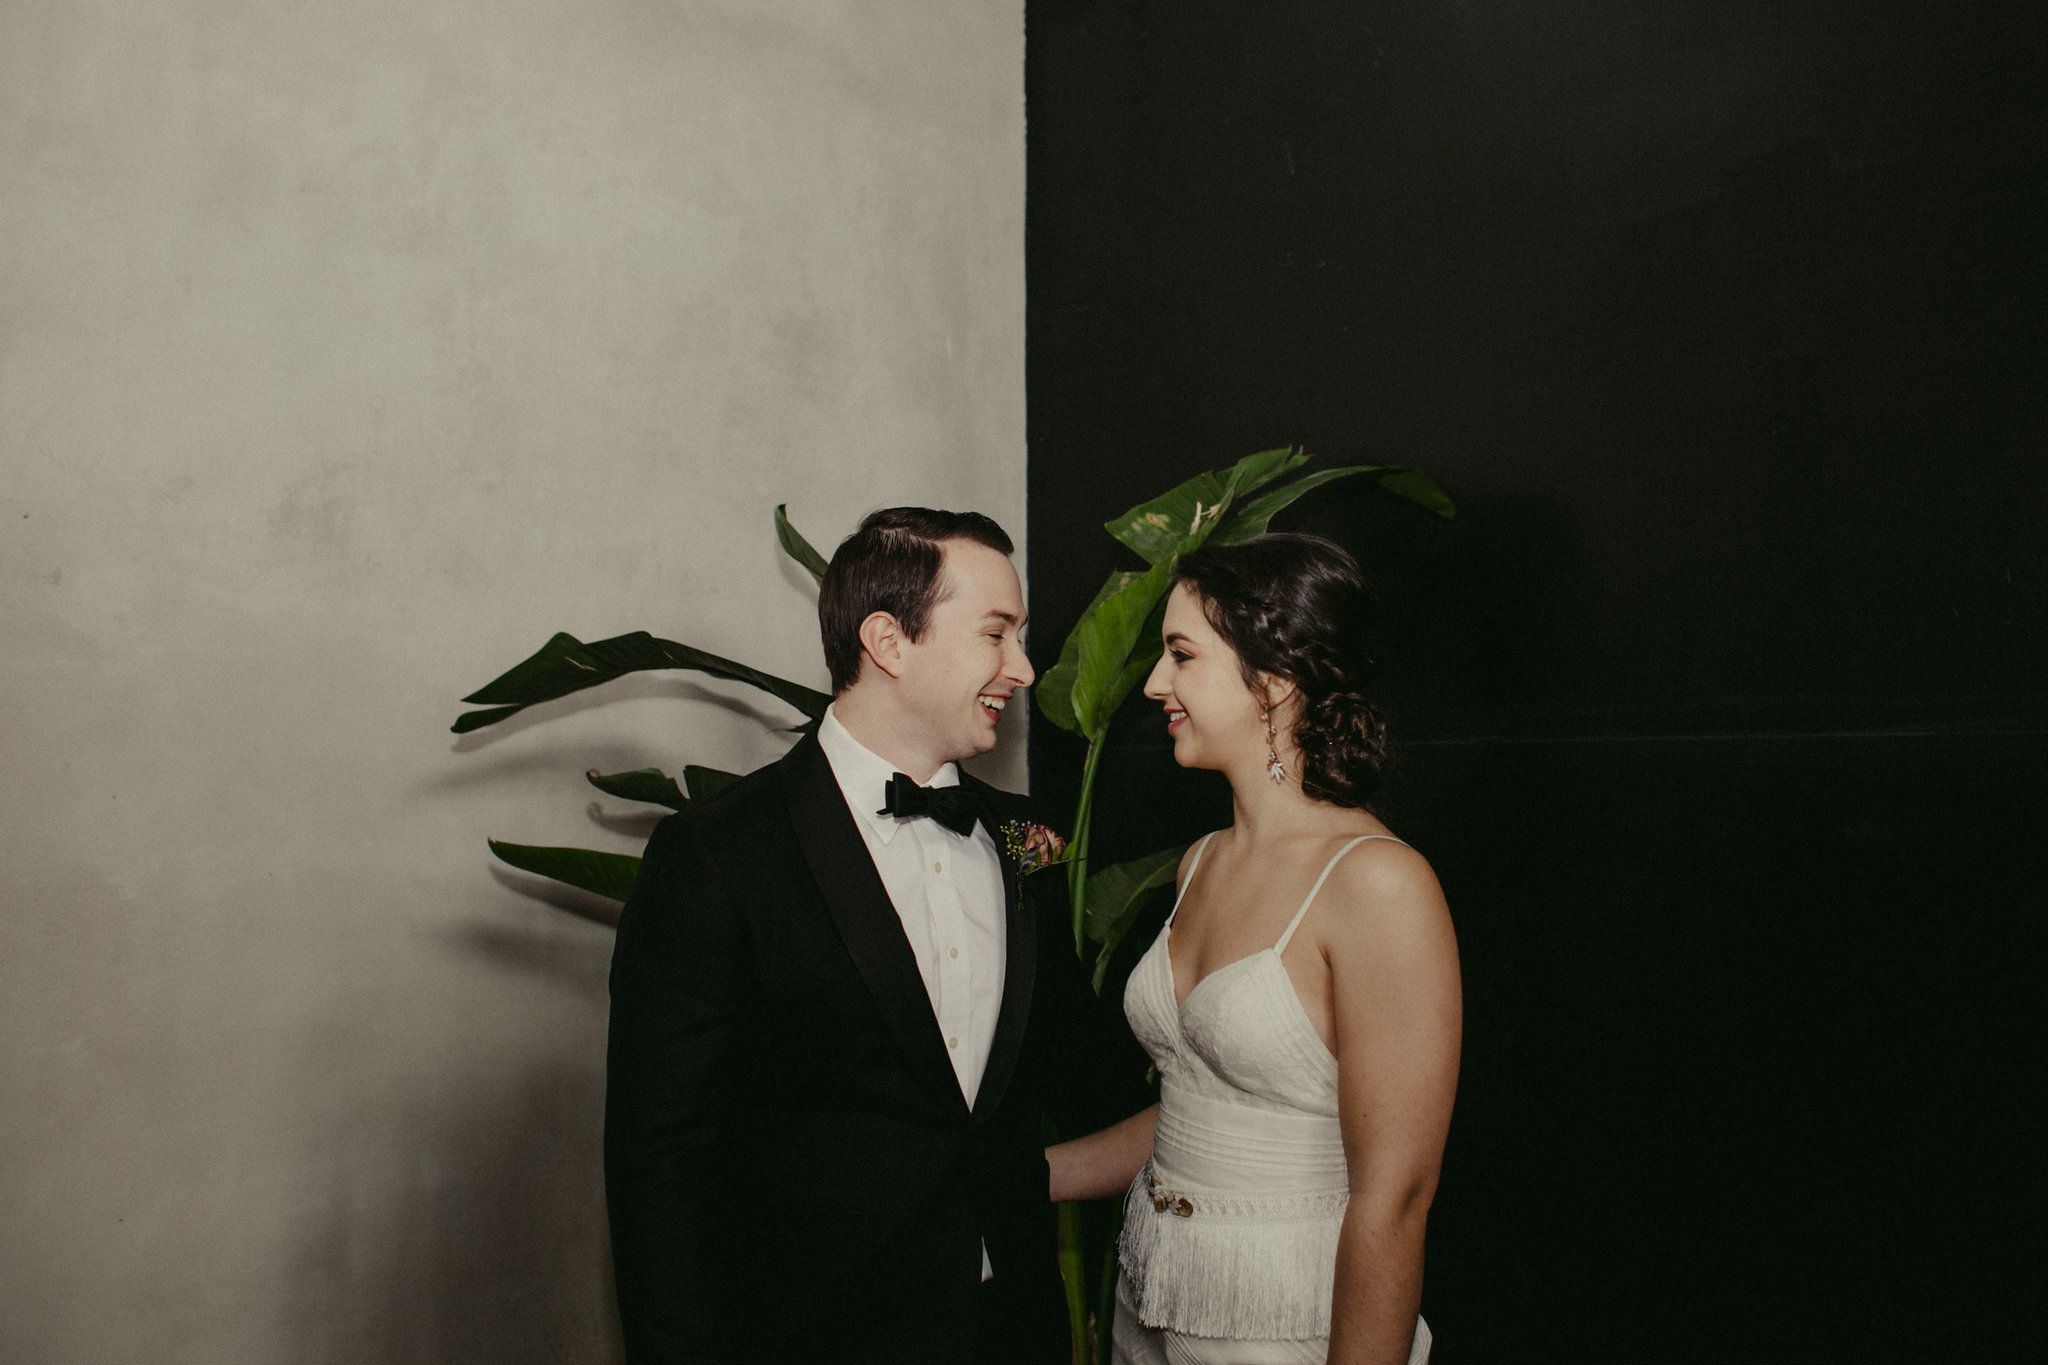 Williamsburg_Hotel_Wedding_Photographer_Chellise_Michael_Photography-220.jpg